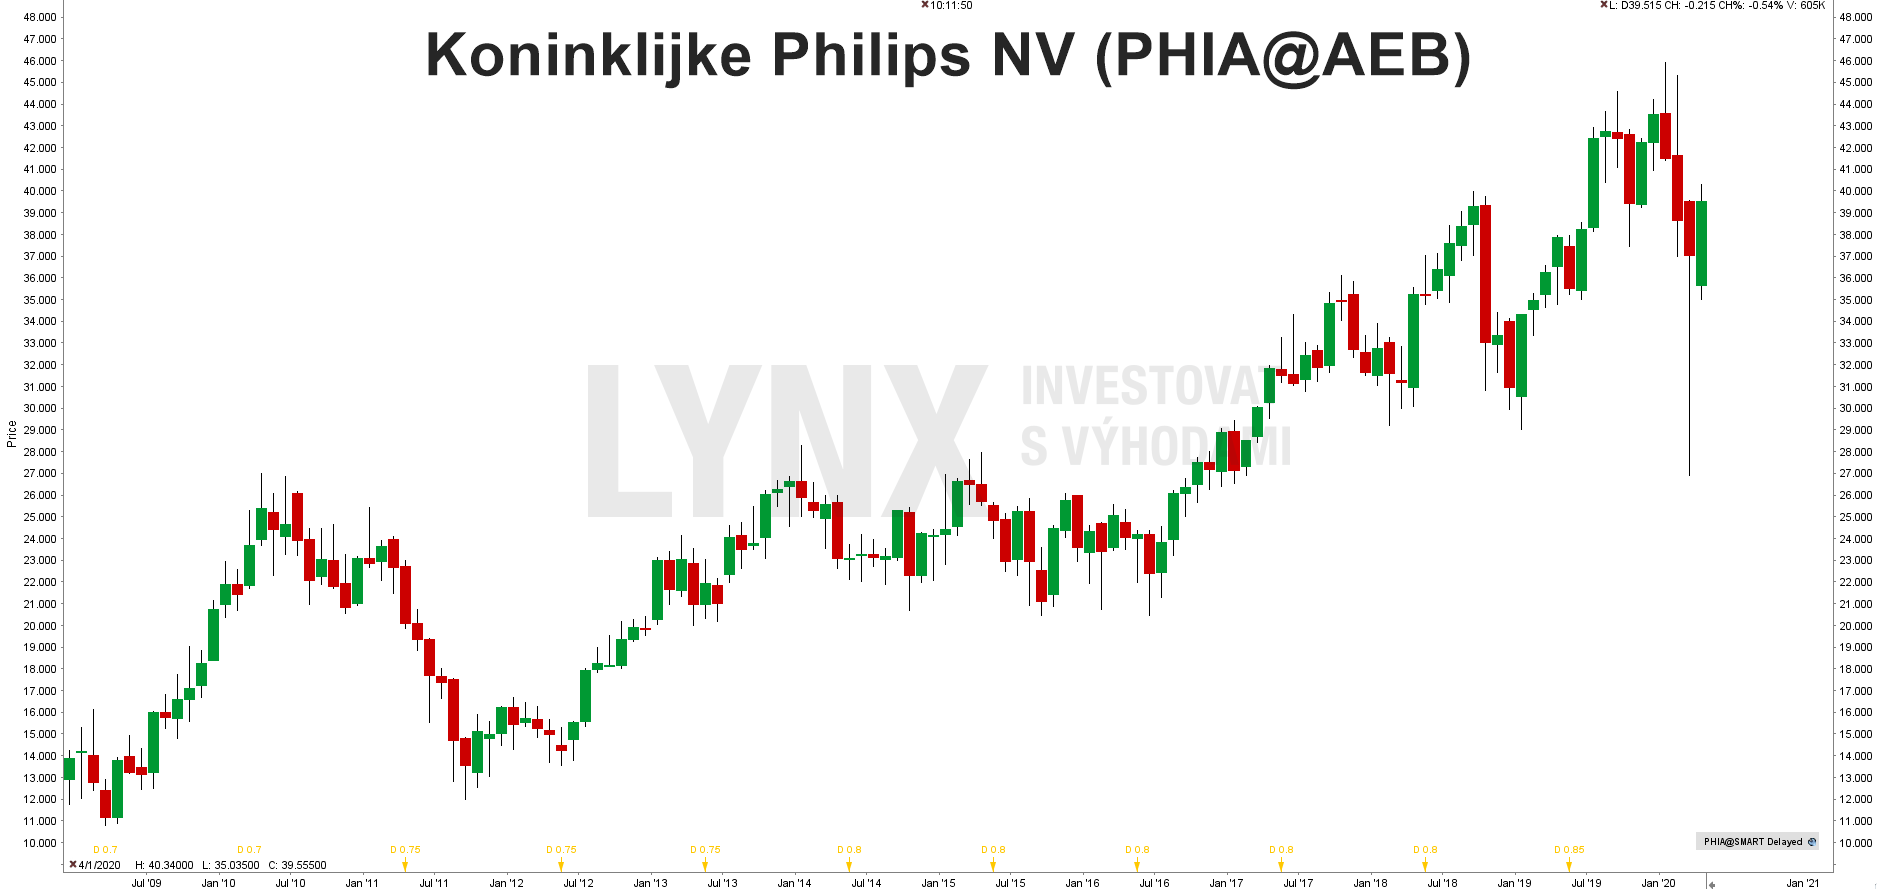 Graf akcie Koninklijke Philips N.V